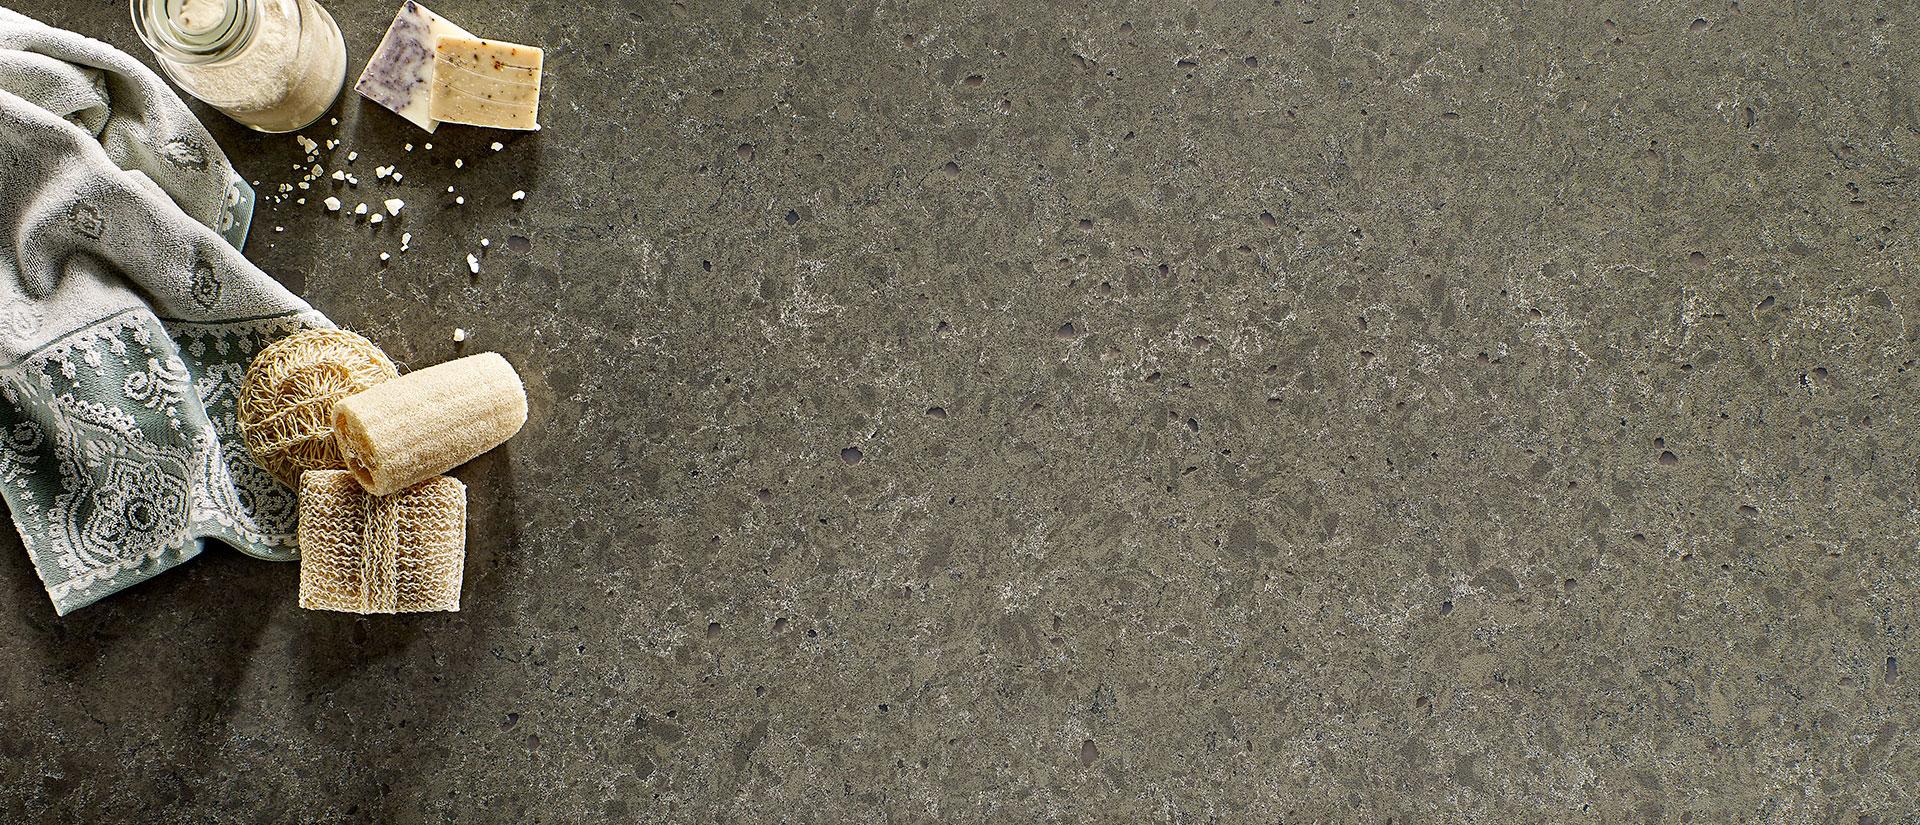 Babylon Gray Concrete Quartz Countertops Vignette 4